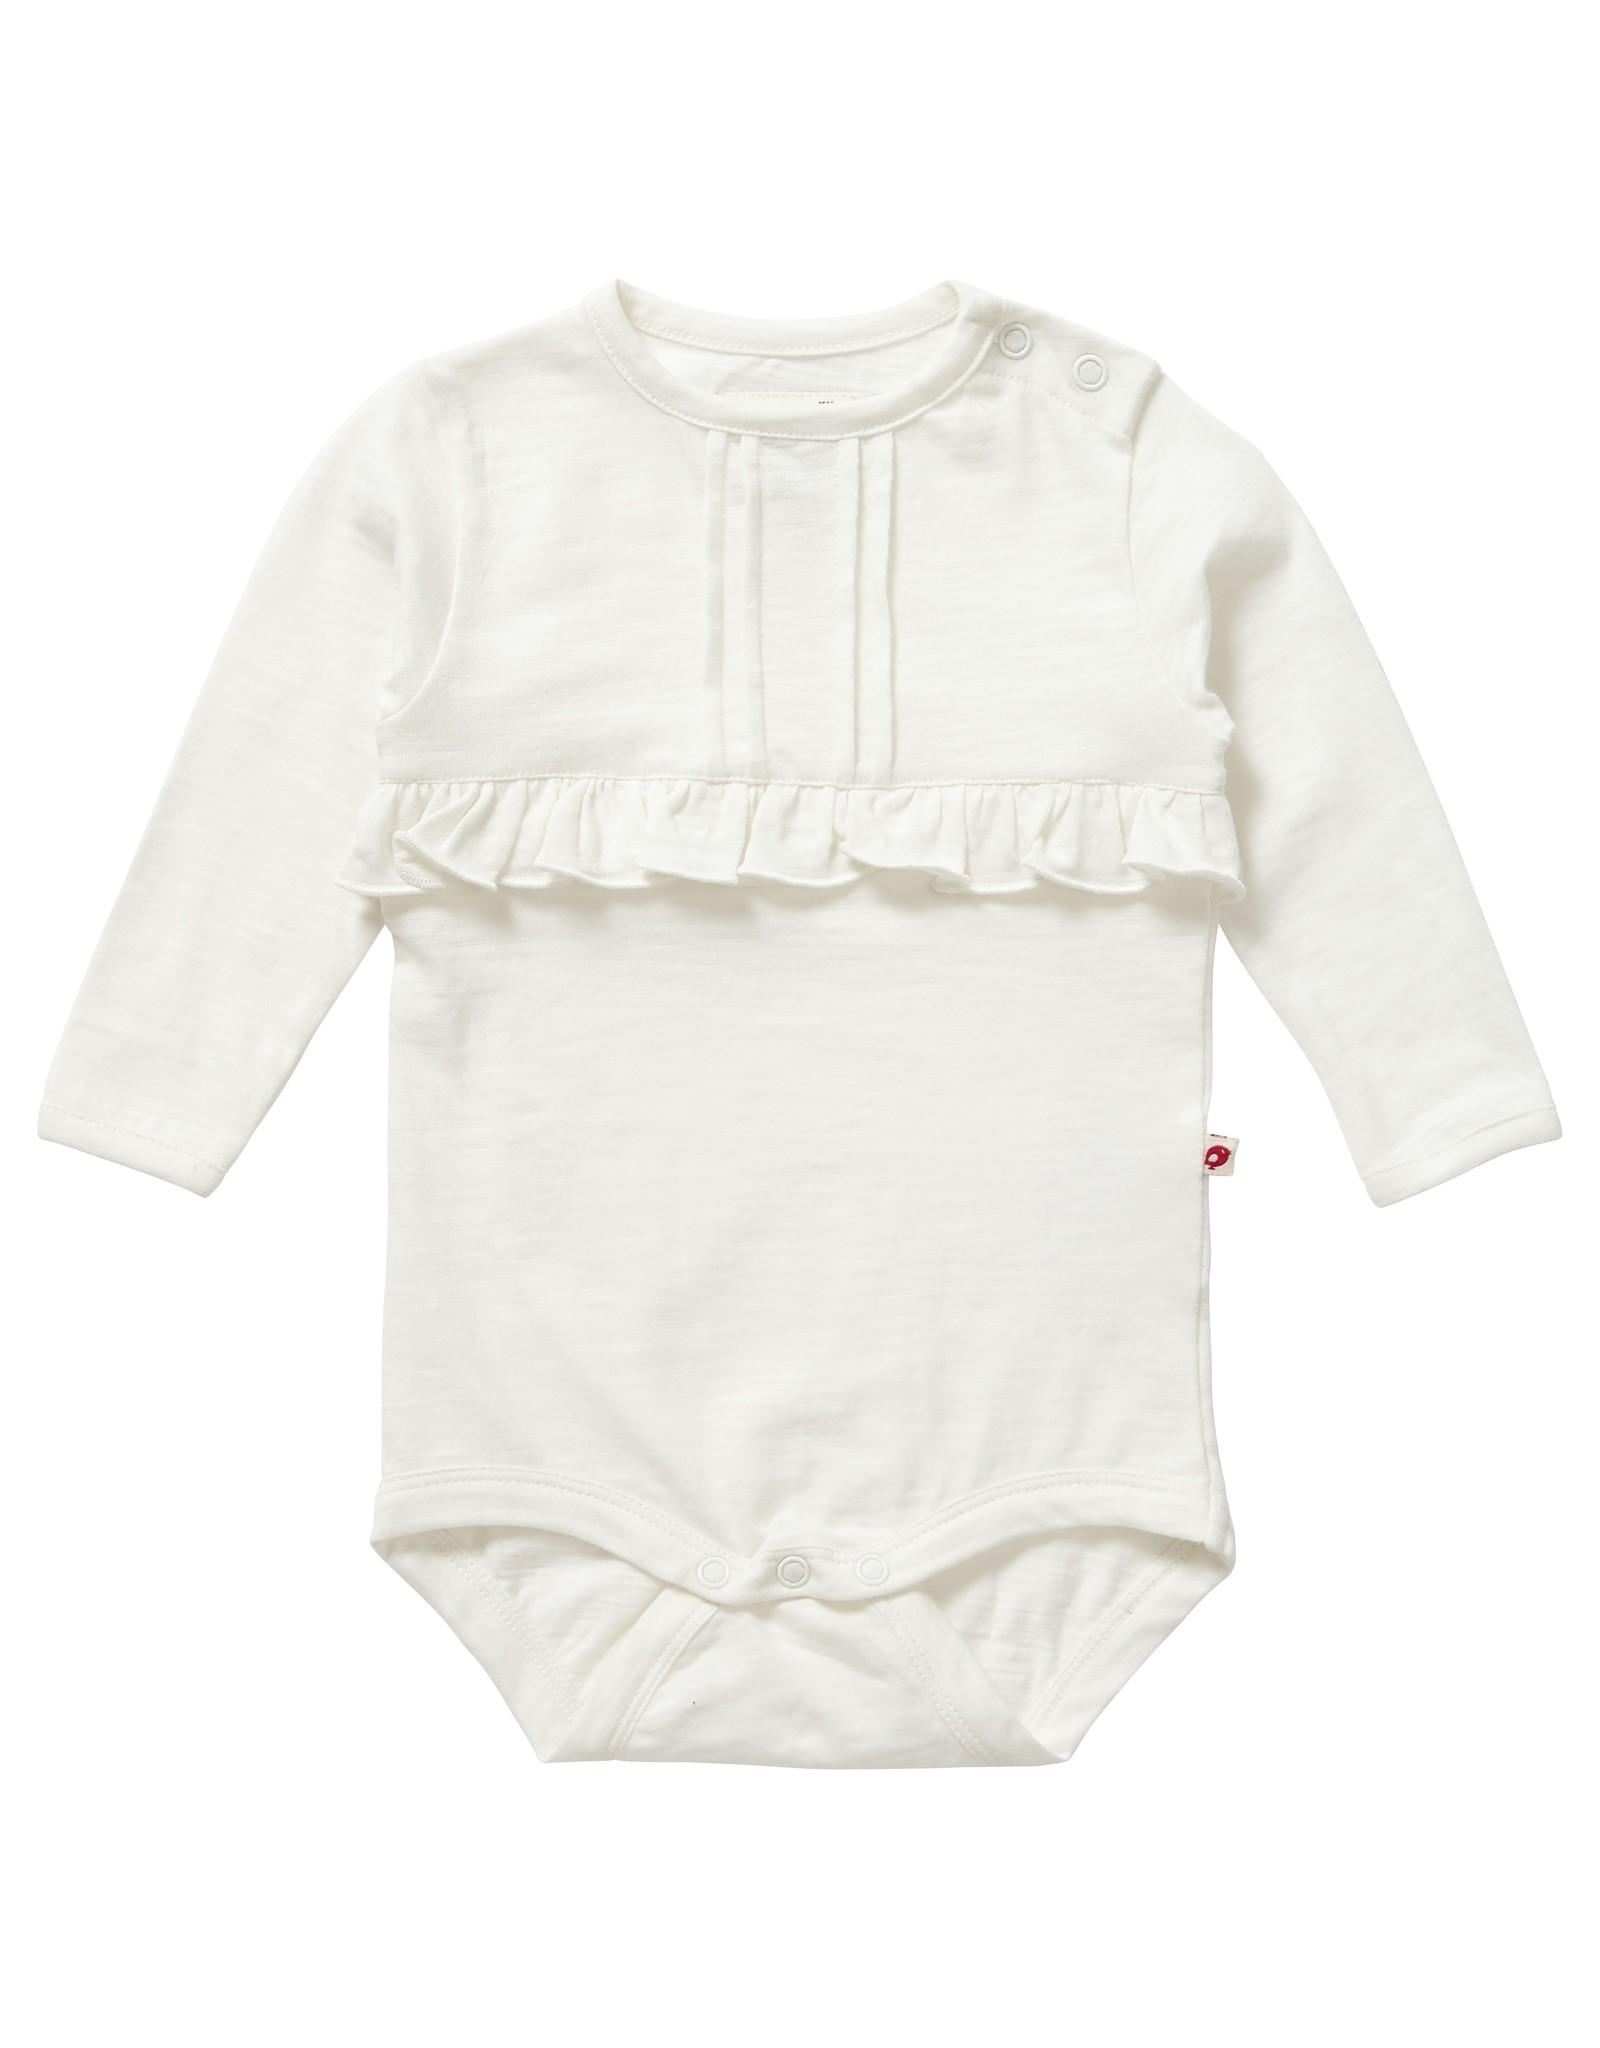 Piccalilly Baby Bodysuit - Cream Slub